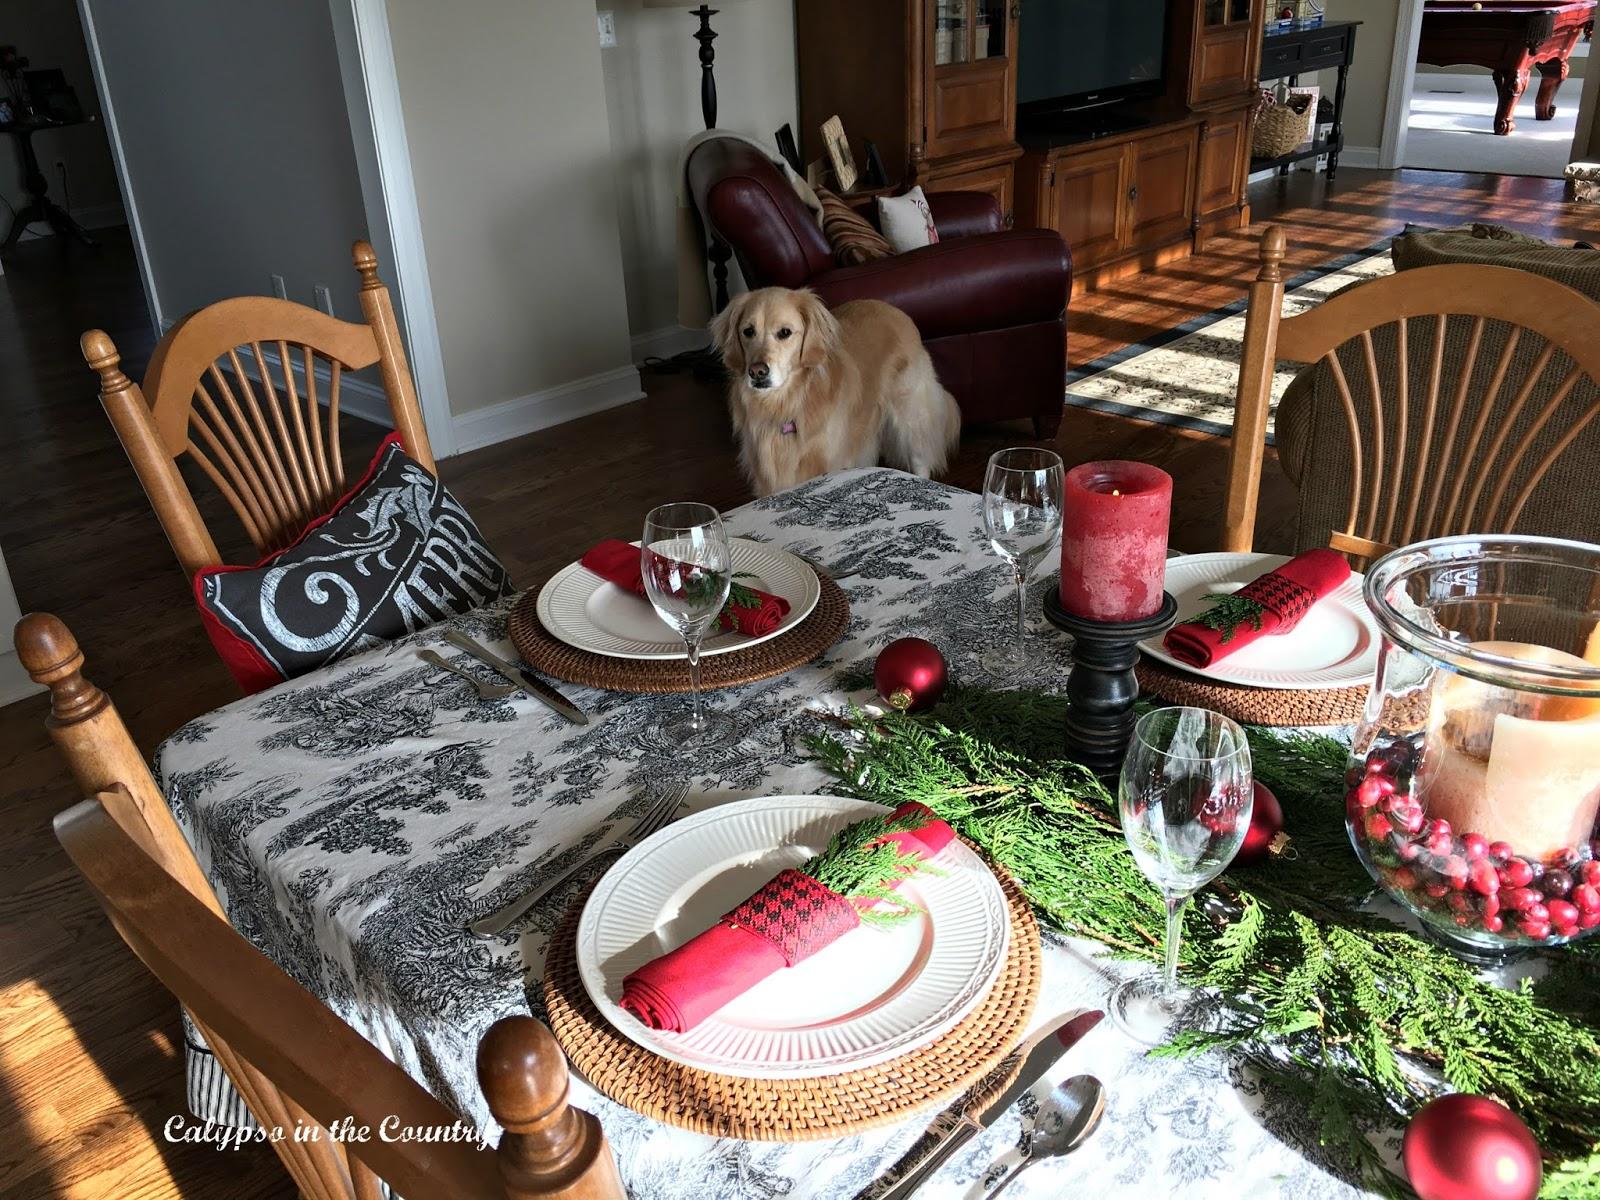 Christmas Table and Golden Retriever